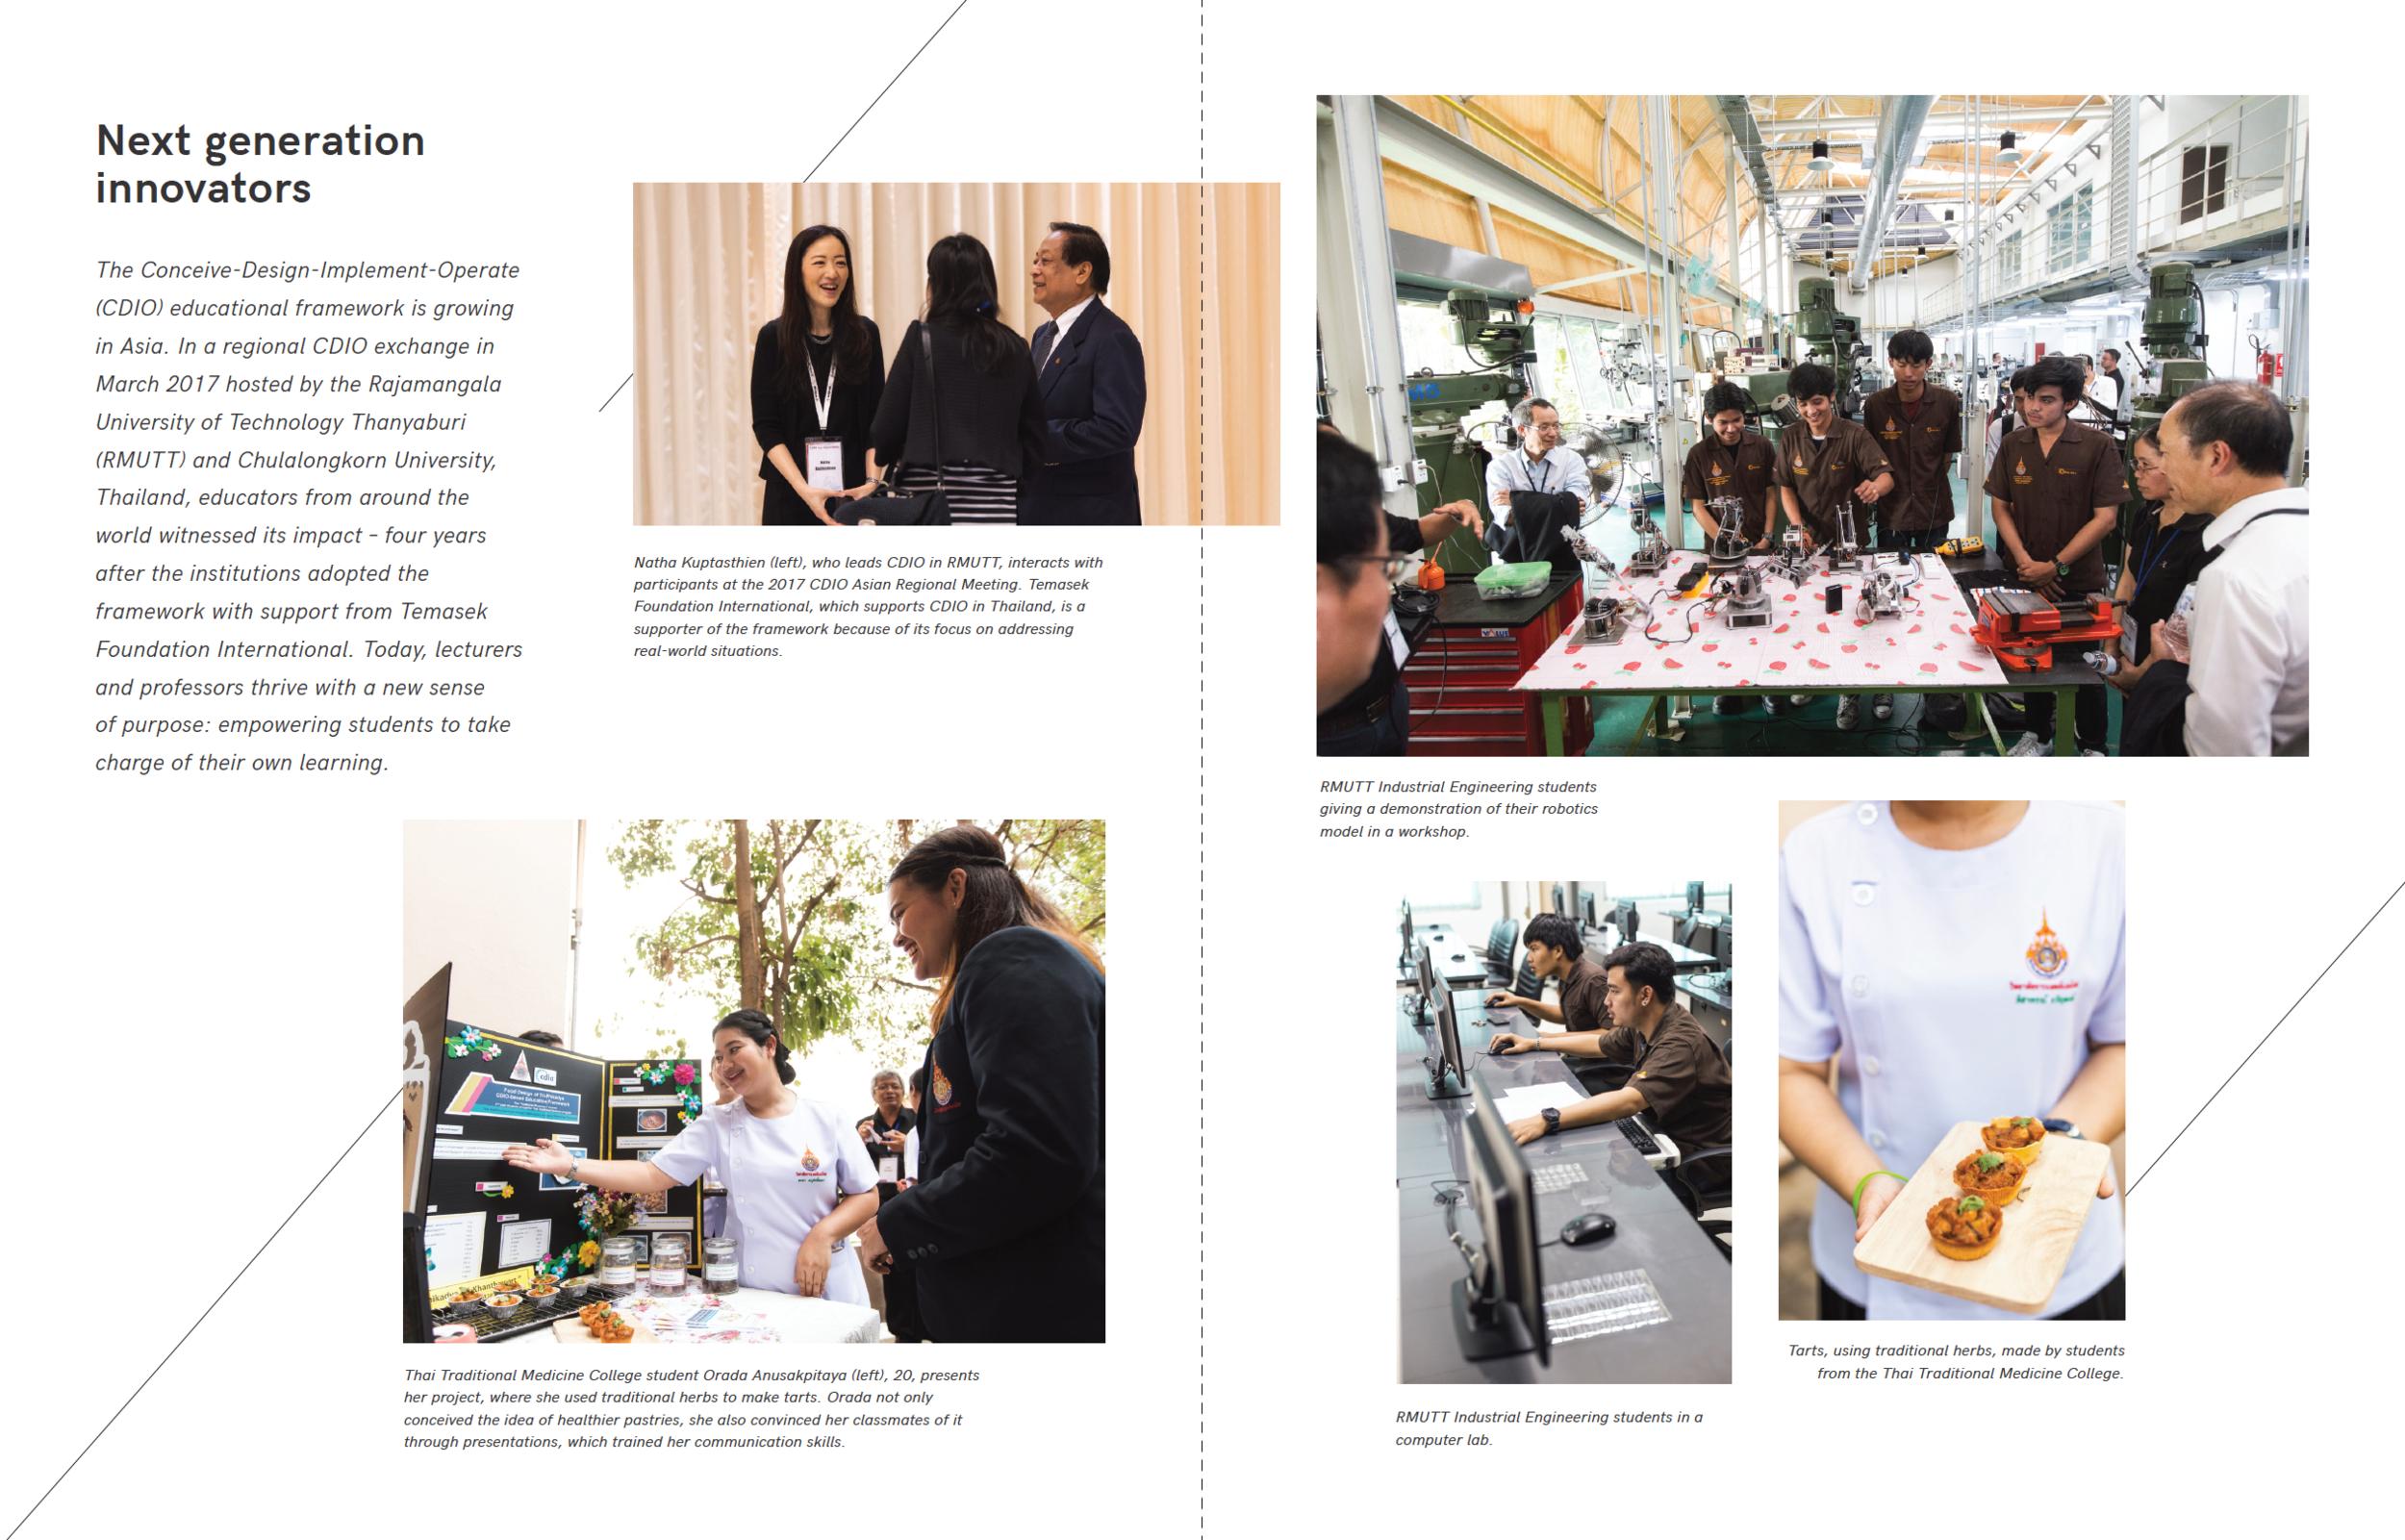 singapore-photographer-zainal-zainal-studio-temasek-foundation-international-03.png